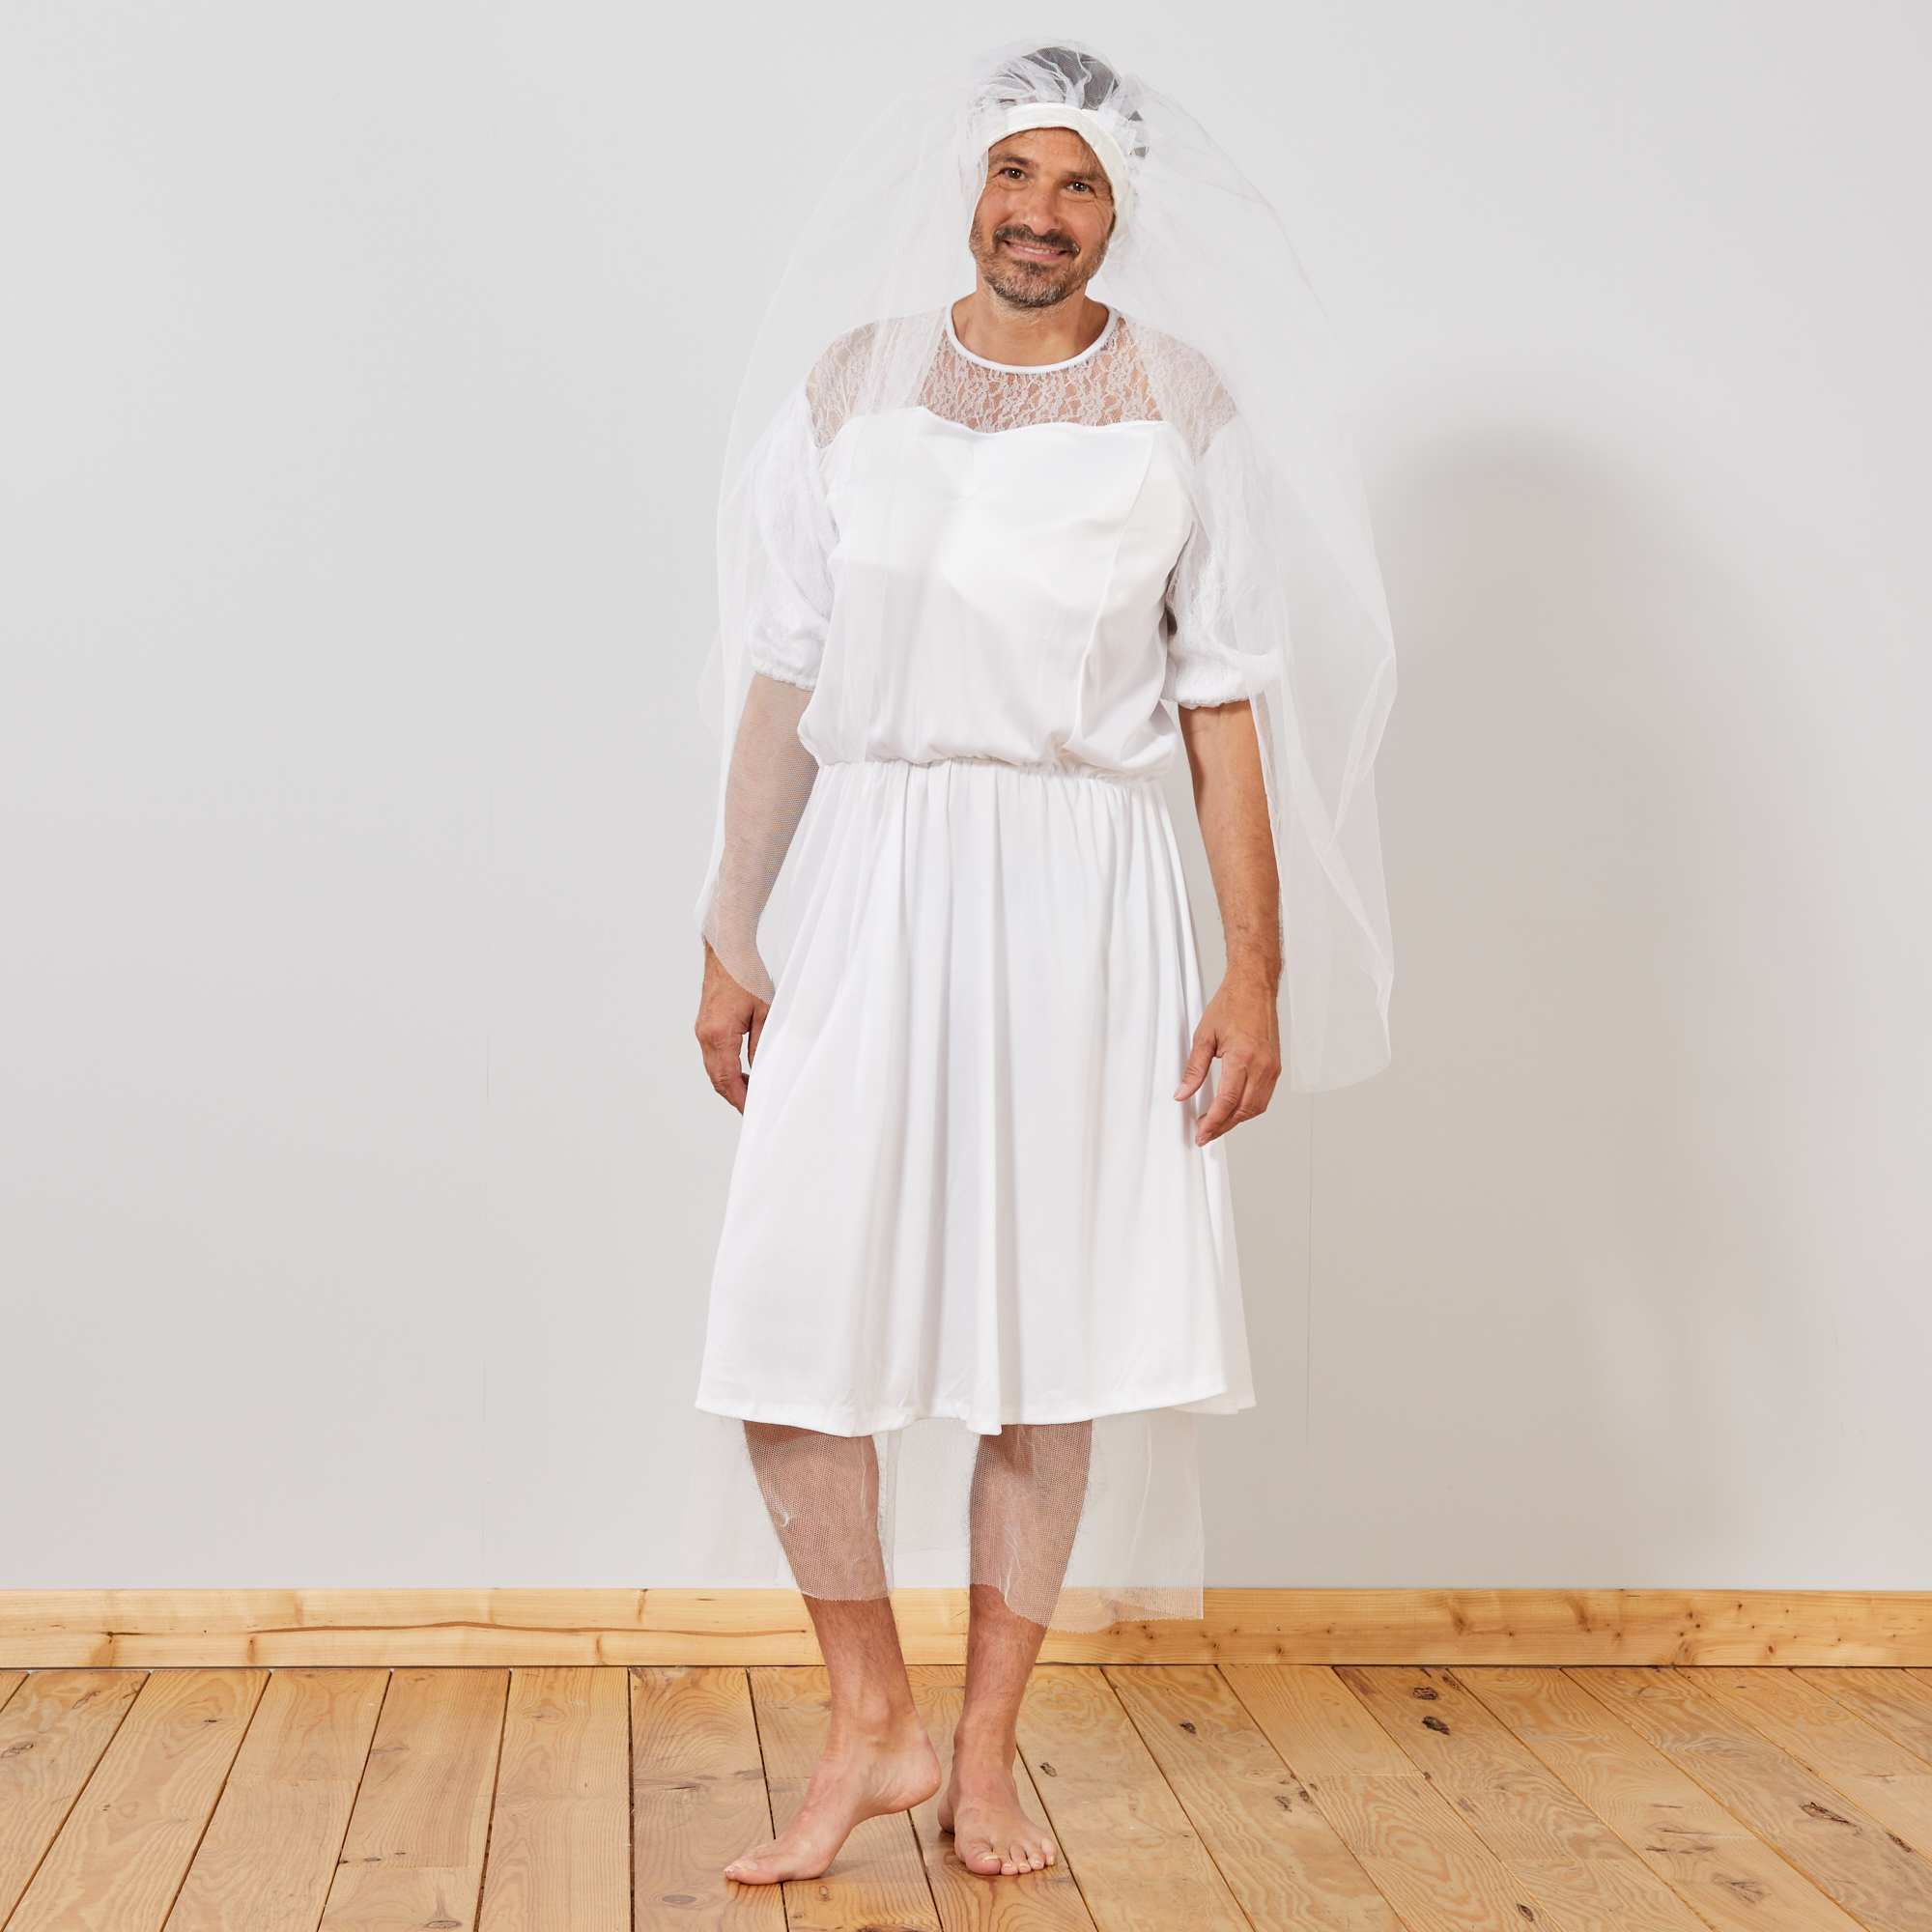 instagram novias de internet disfraz